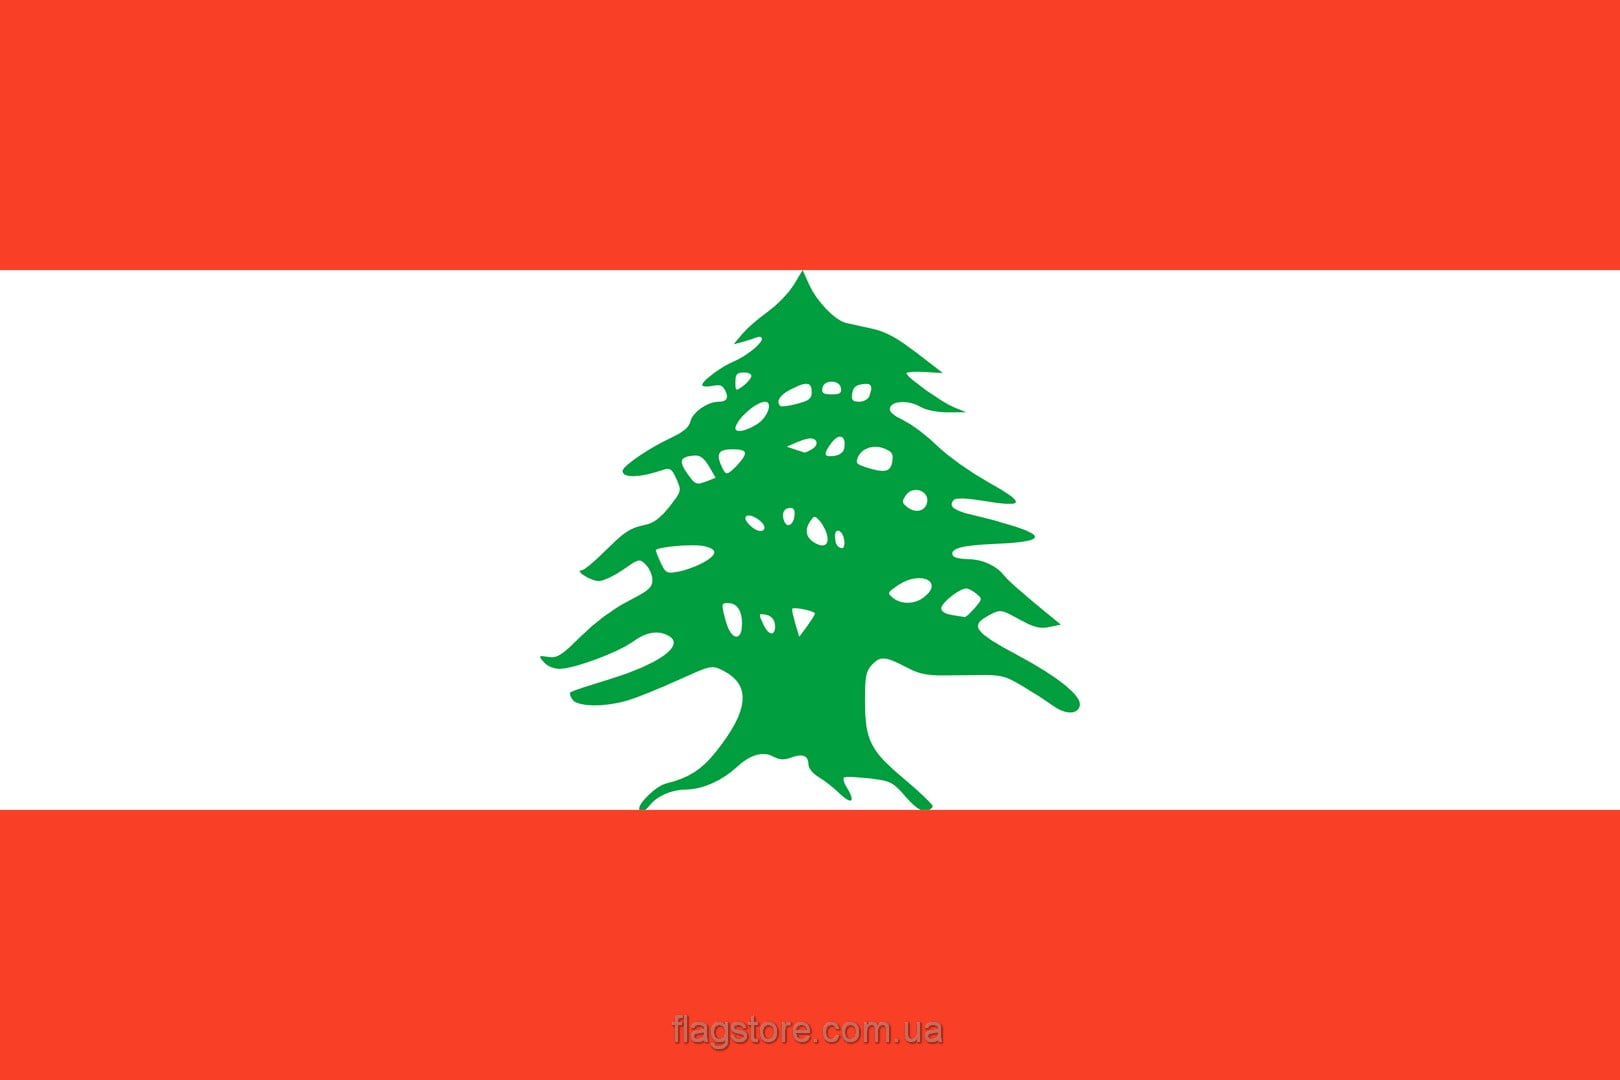 Купить флаг Ливана (страны Ливан)